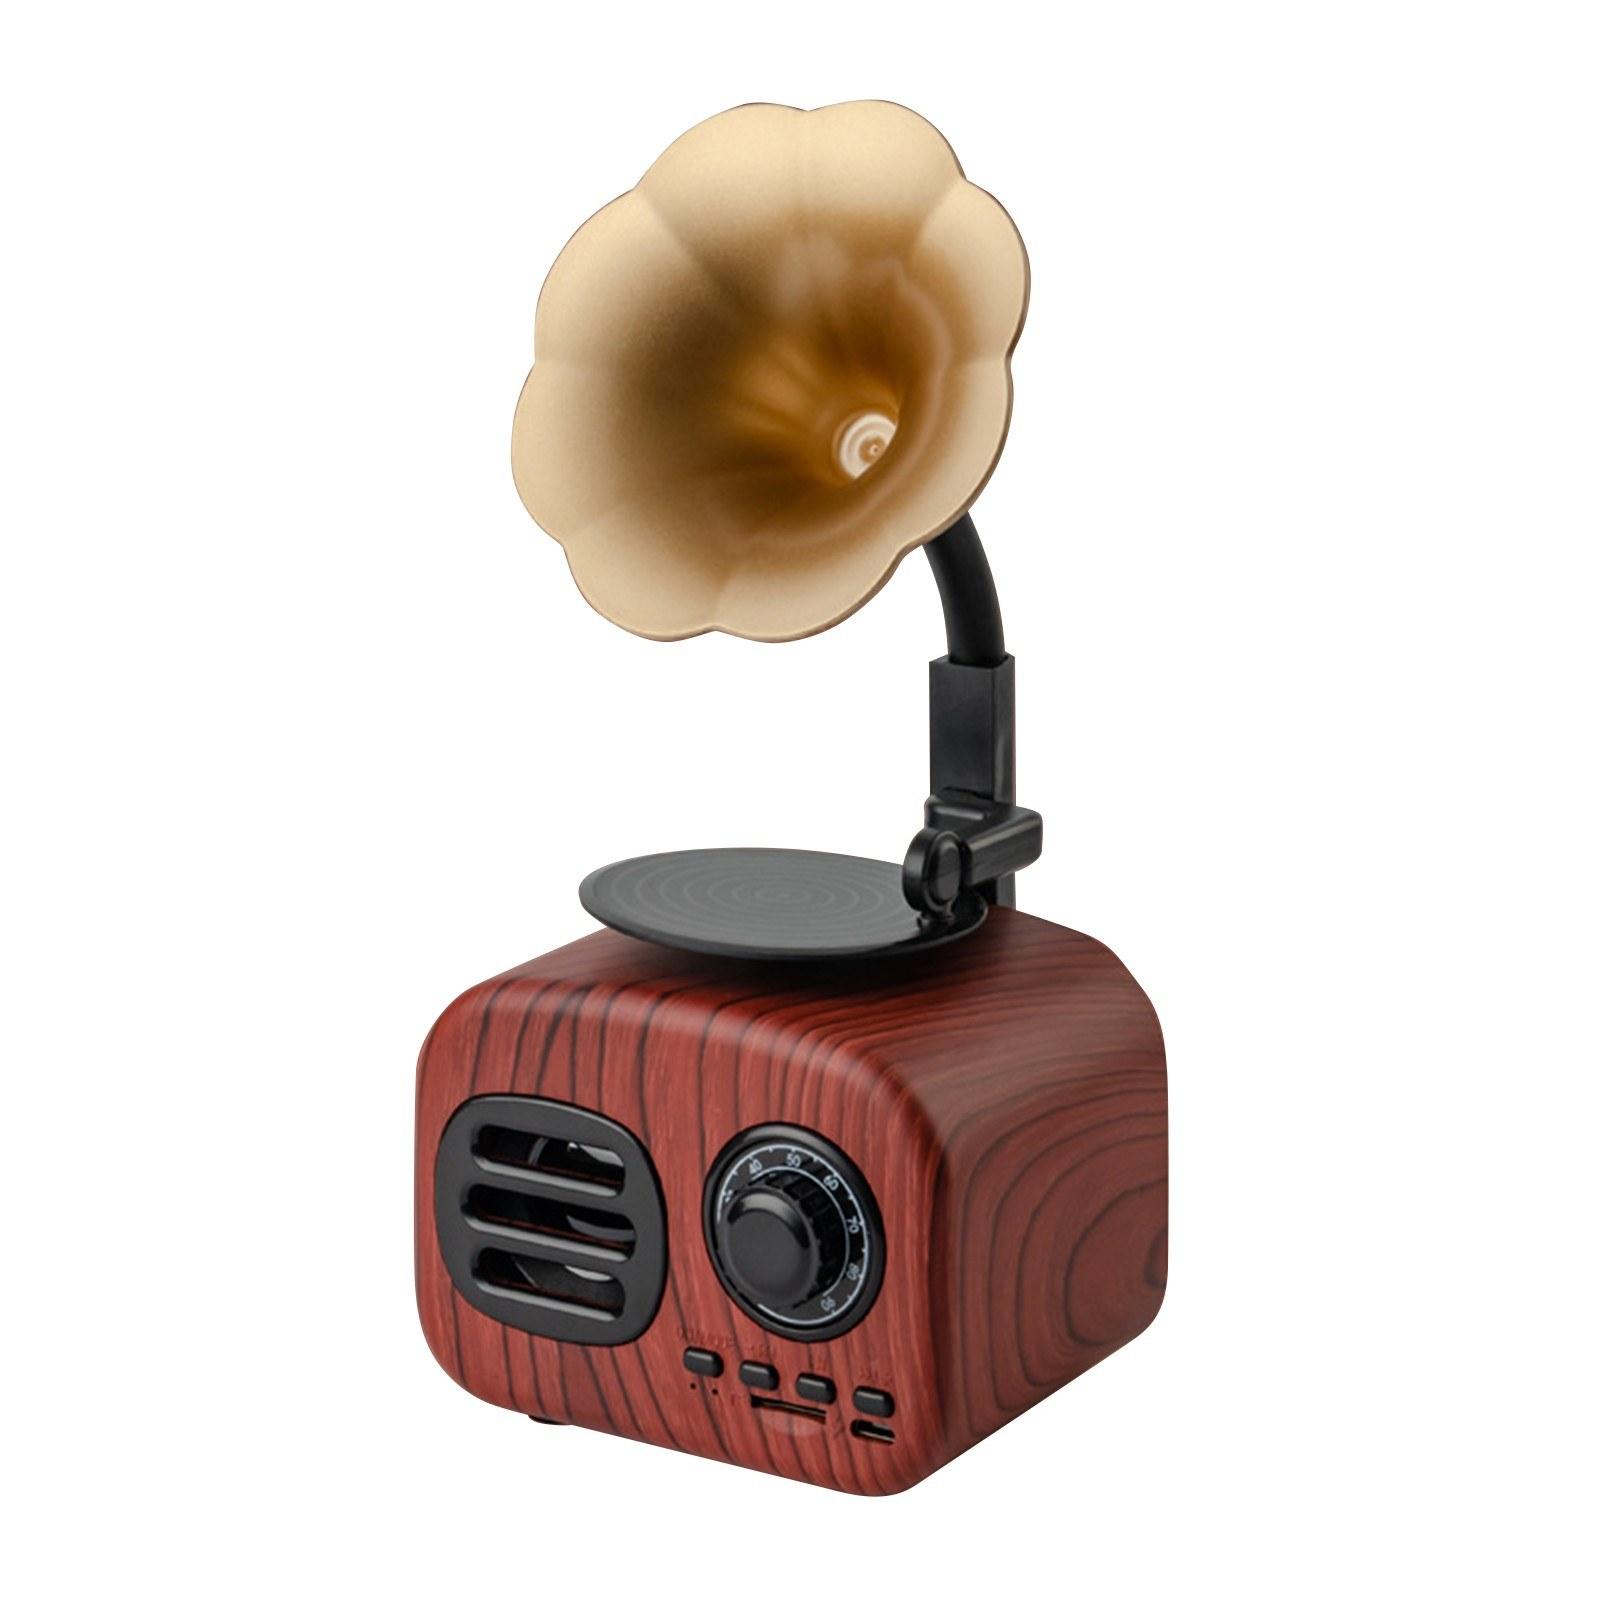 Tomtop - 52% OFF Retro Phonograph Style BT Speaker, $20.99 (Inclusive of VAT)